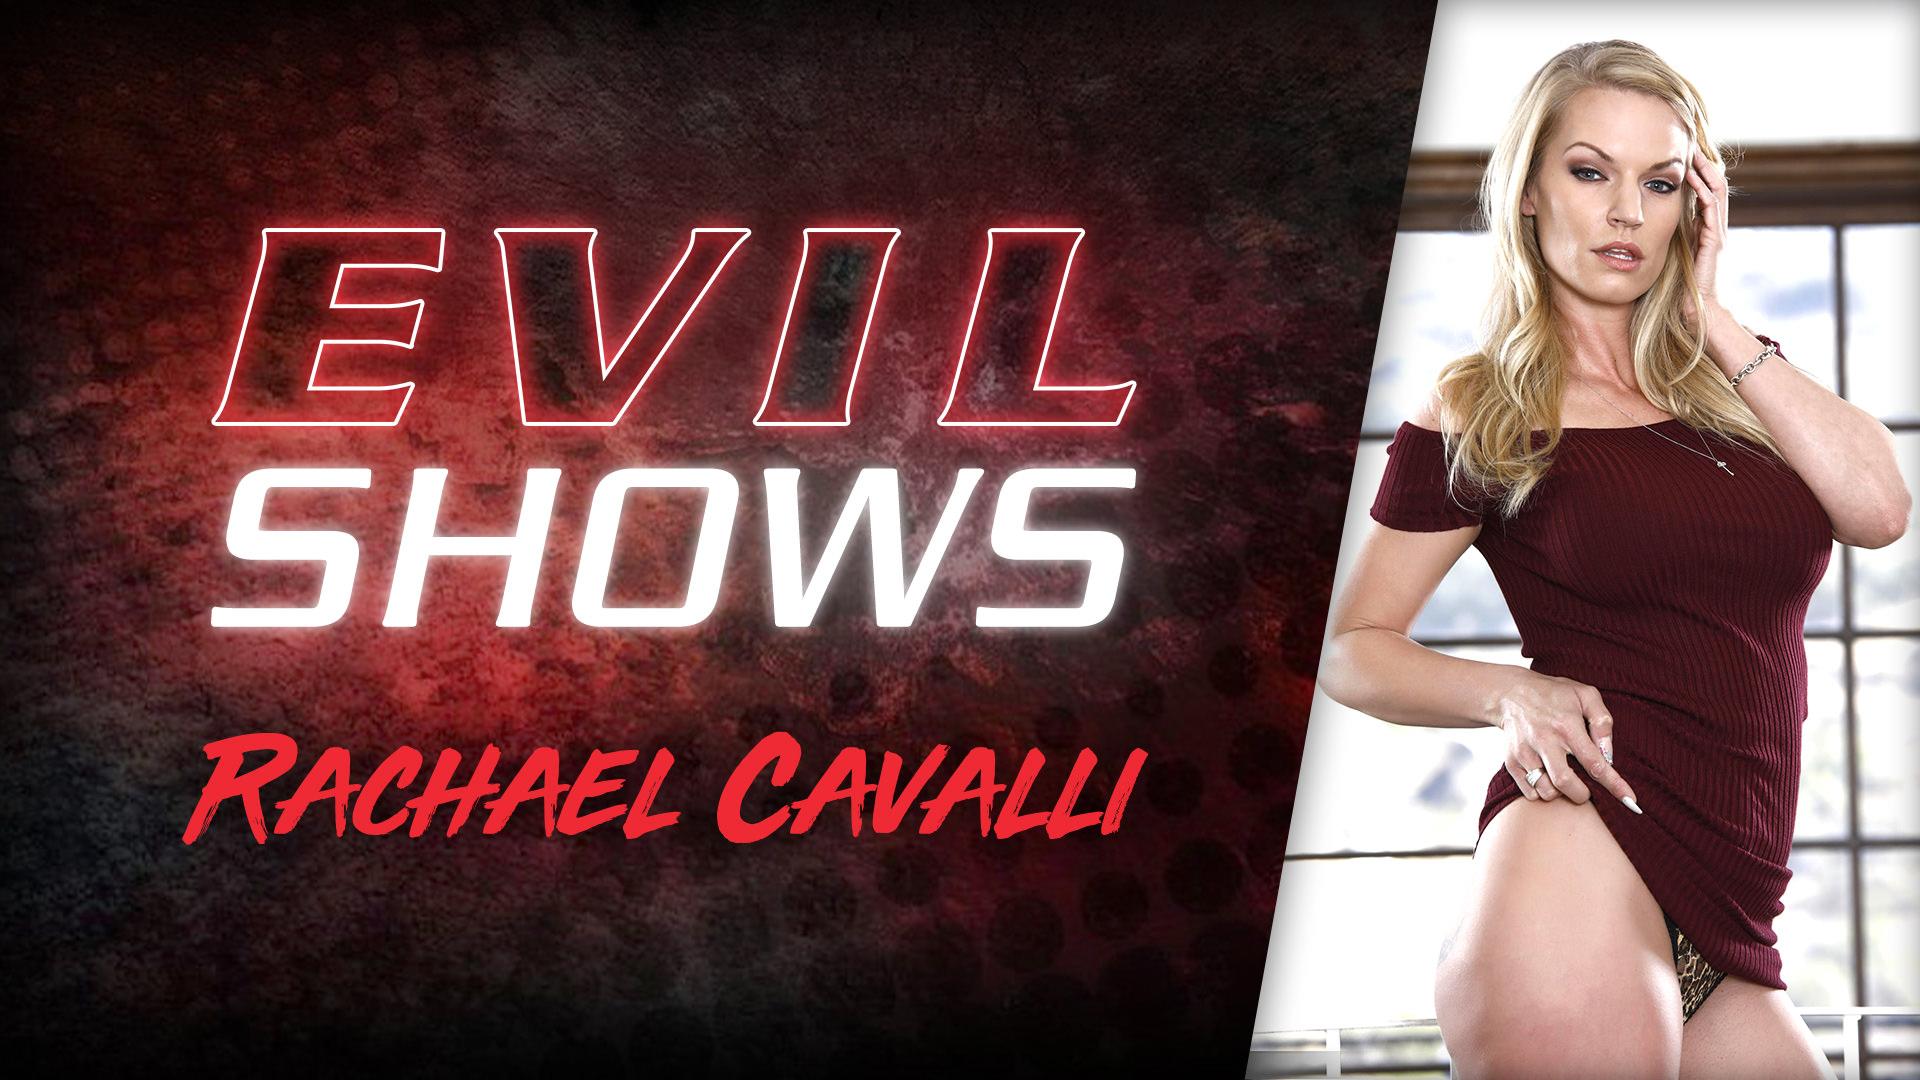 Evil Shows - Rachael Cavalli - Rachael Cavalli 1